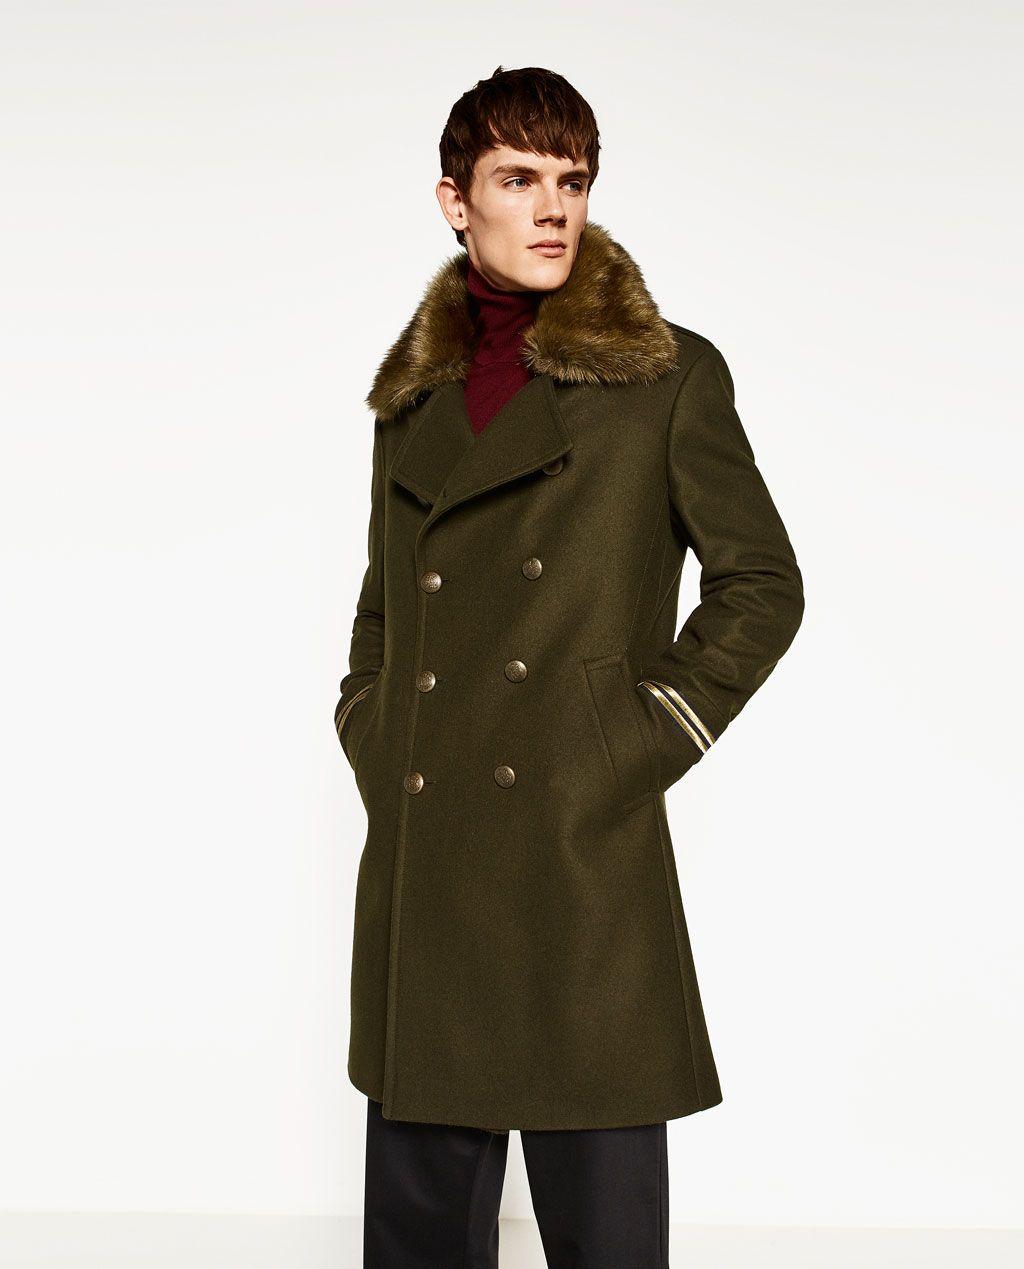 Imagen De Pinterest Angry Militar Zara Fashion Abrigo 2 TaqwHRxT